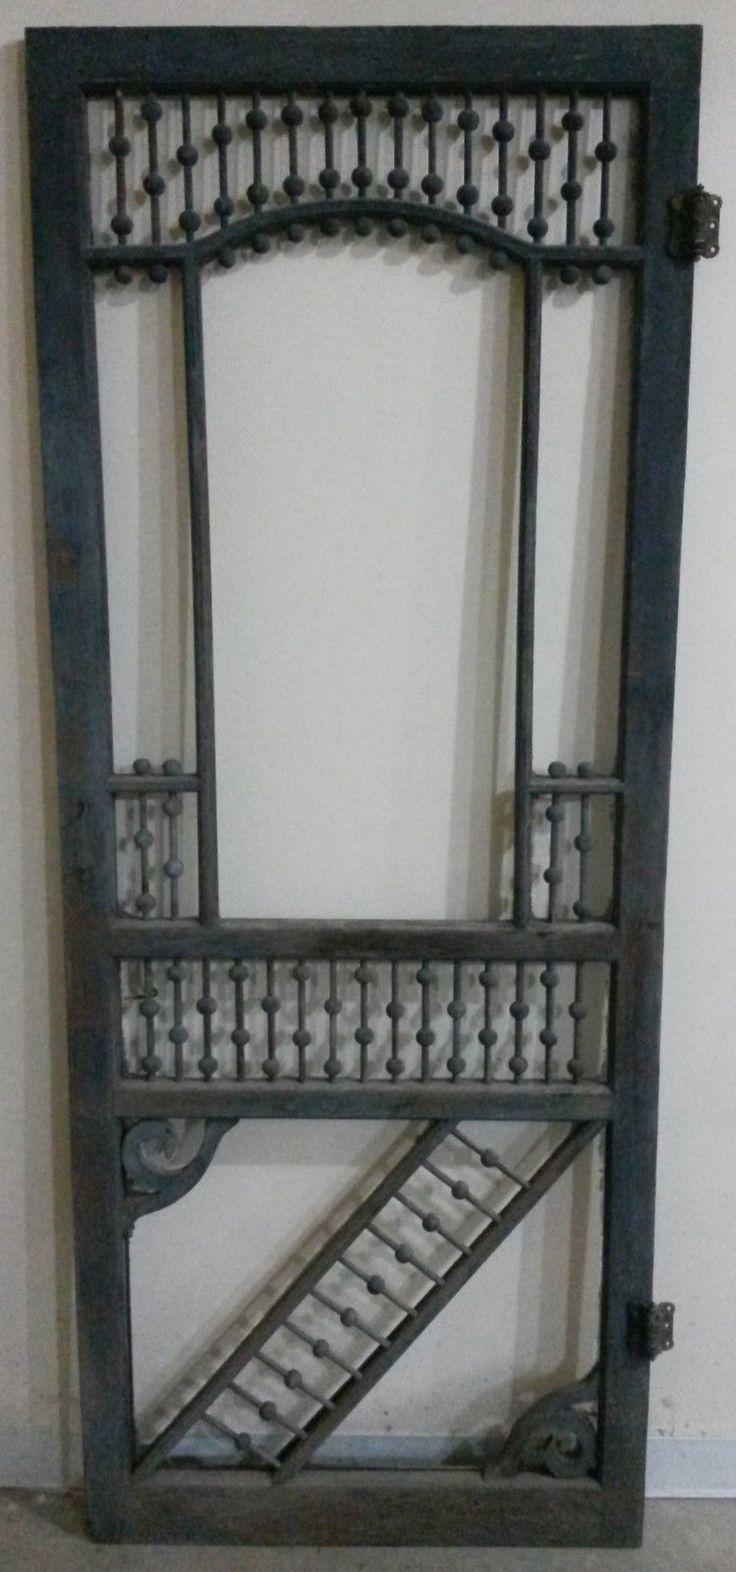 Victorian Screen Door, Original Condition | eBay